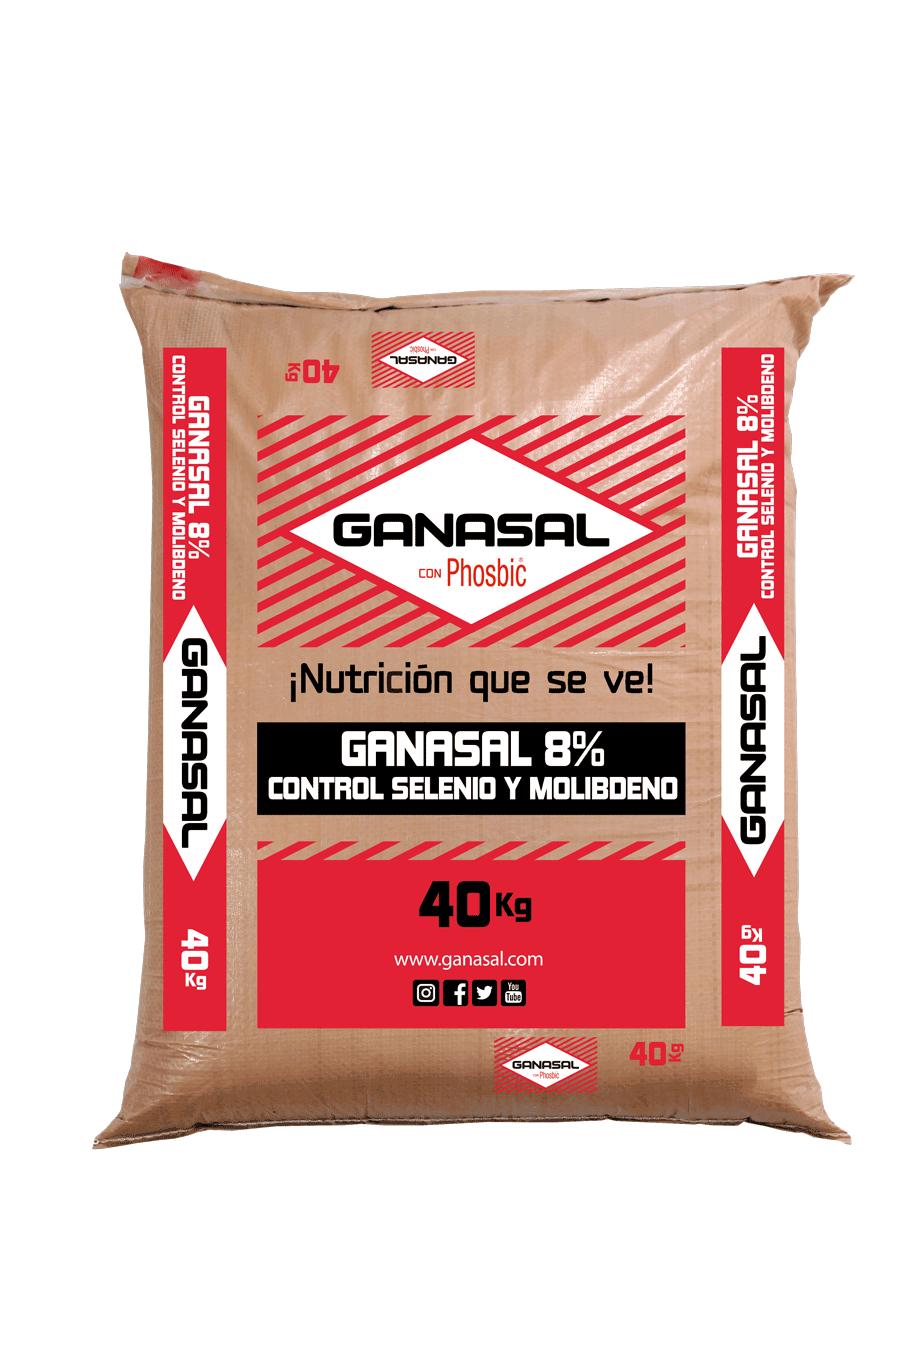 Ganasal 8% Control Selenio - Molibdeno